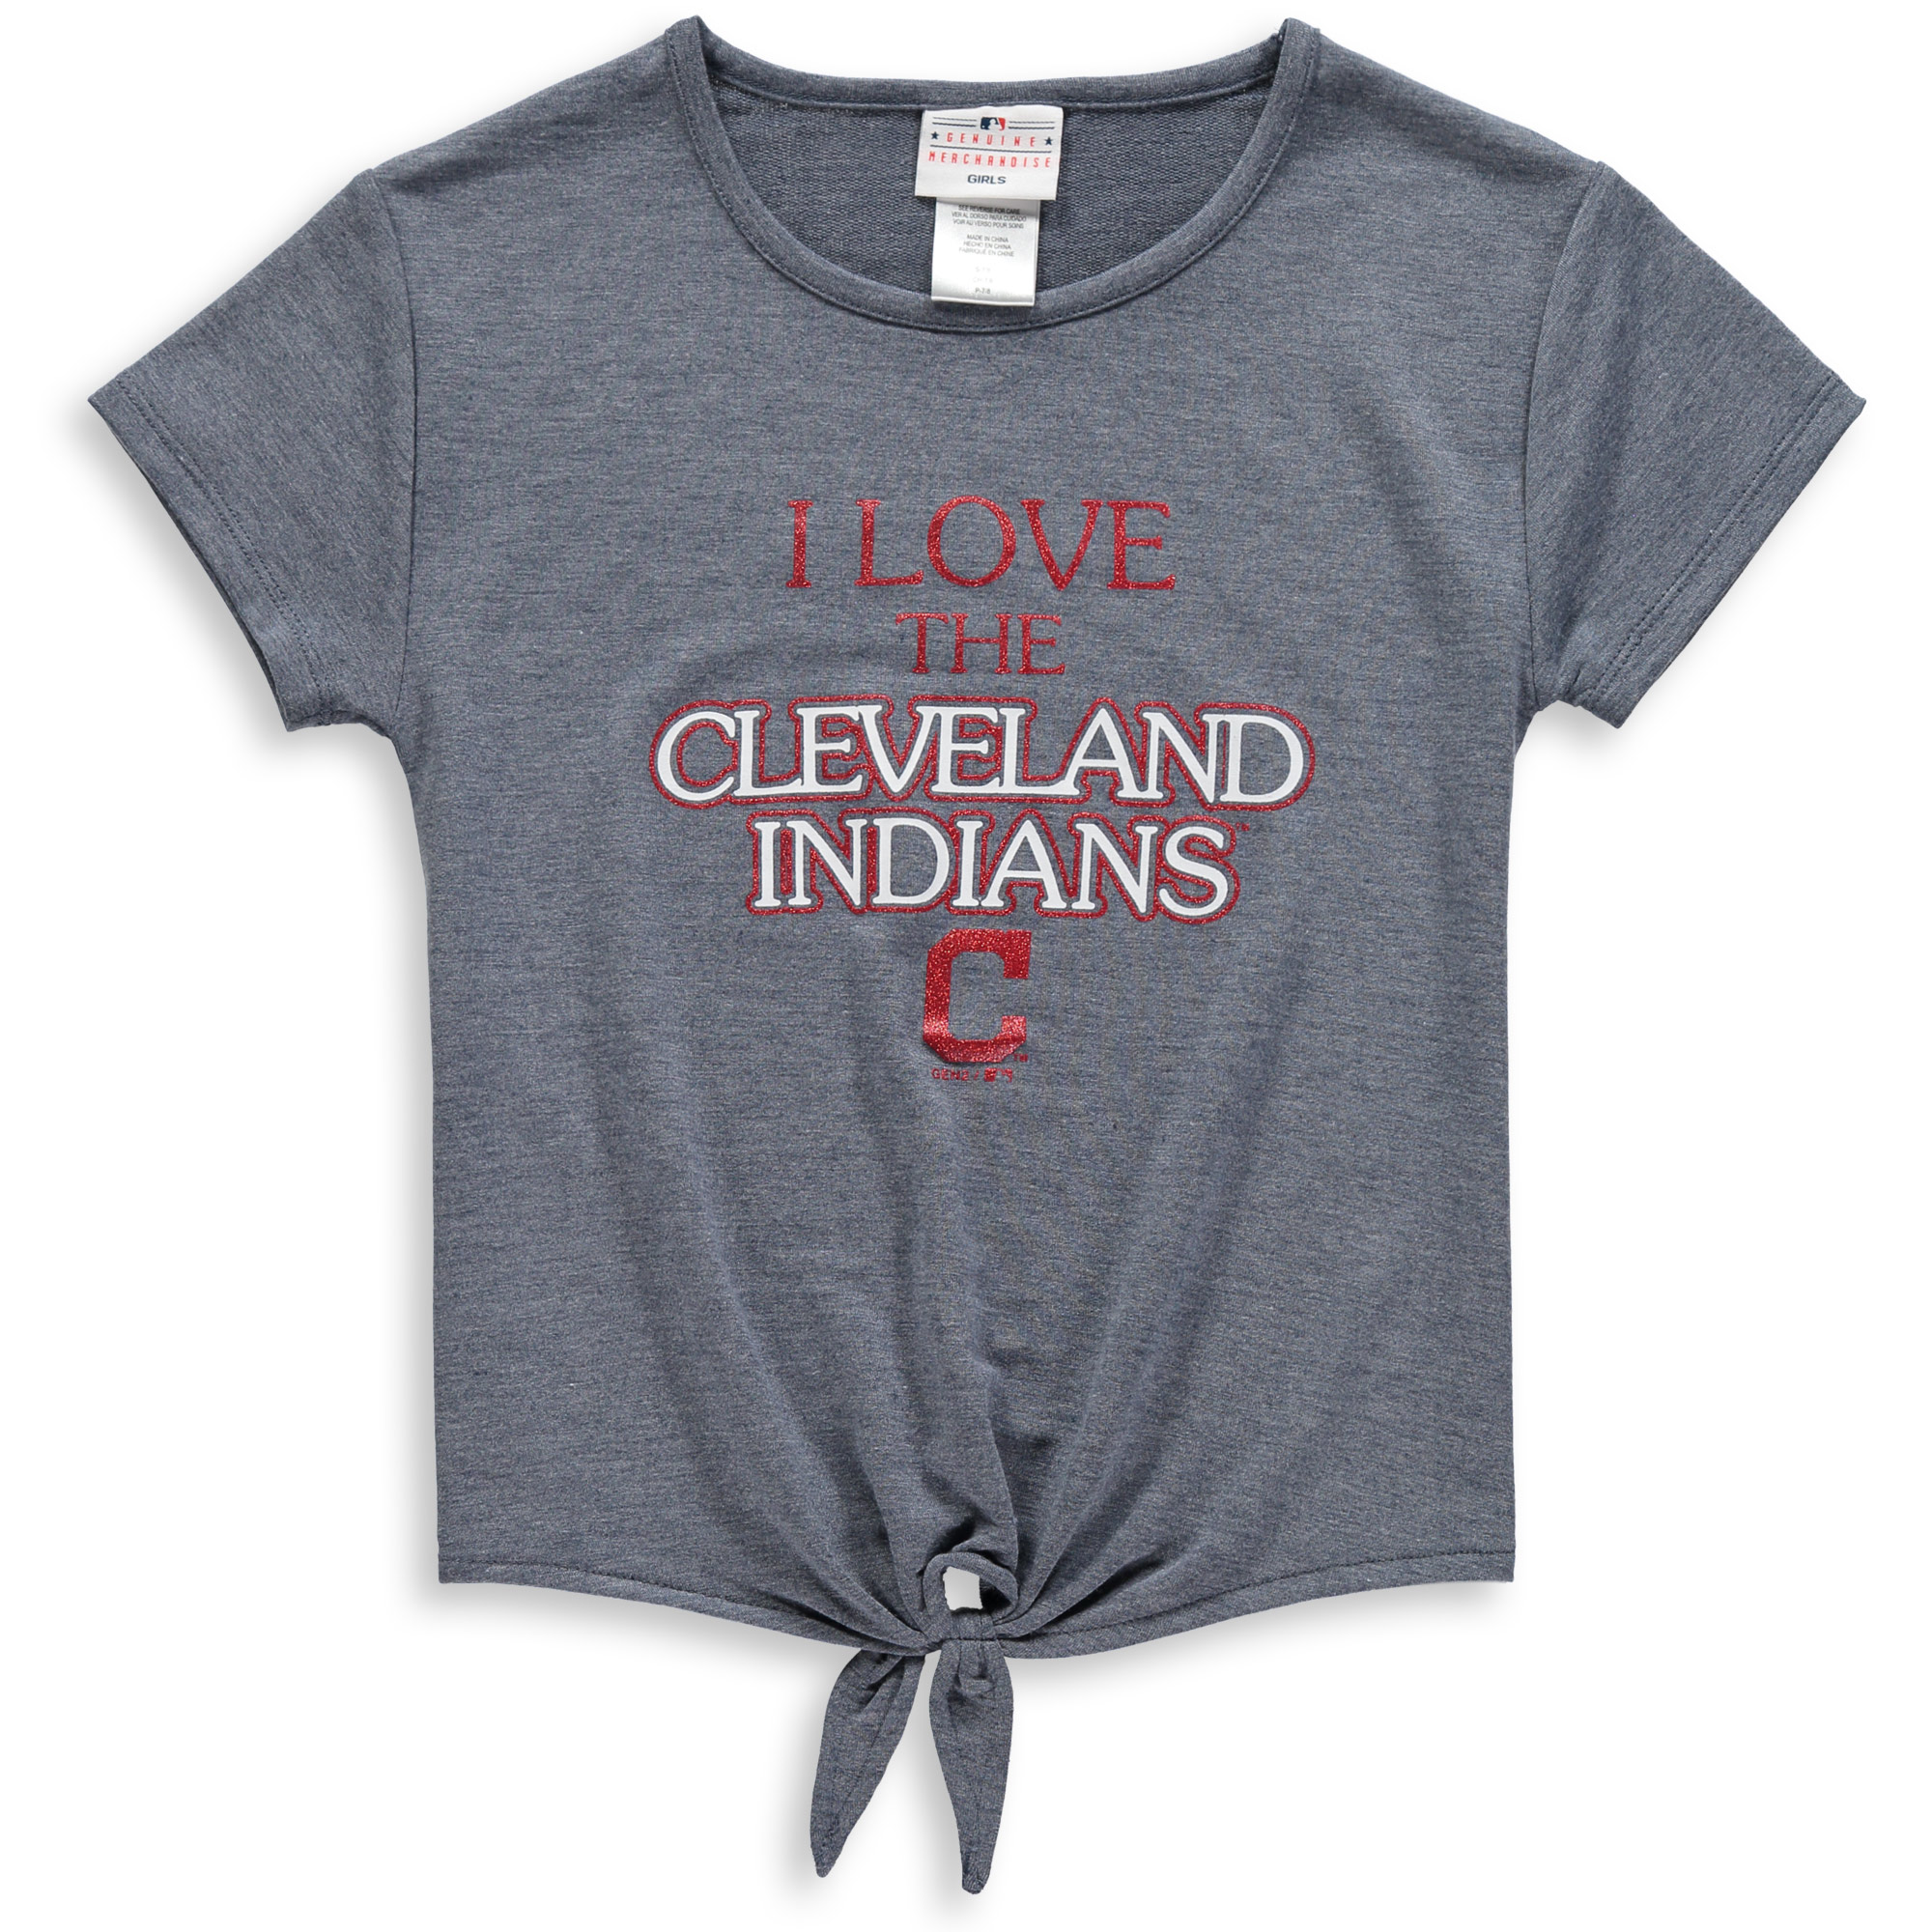 Cleveland Indians Girls Youth True Love Tie Bottom Tri-Blend T-Shirt - Heathered Navy